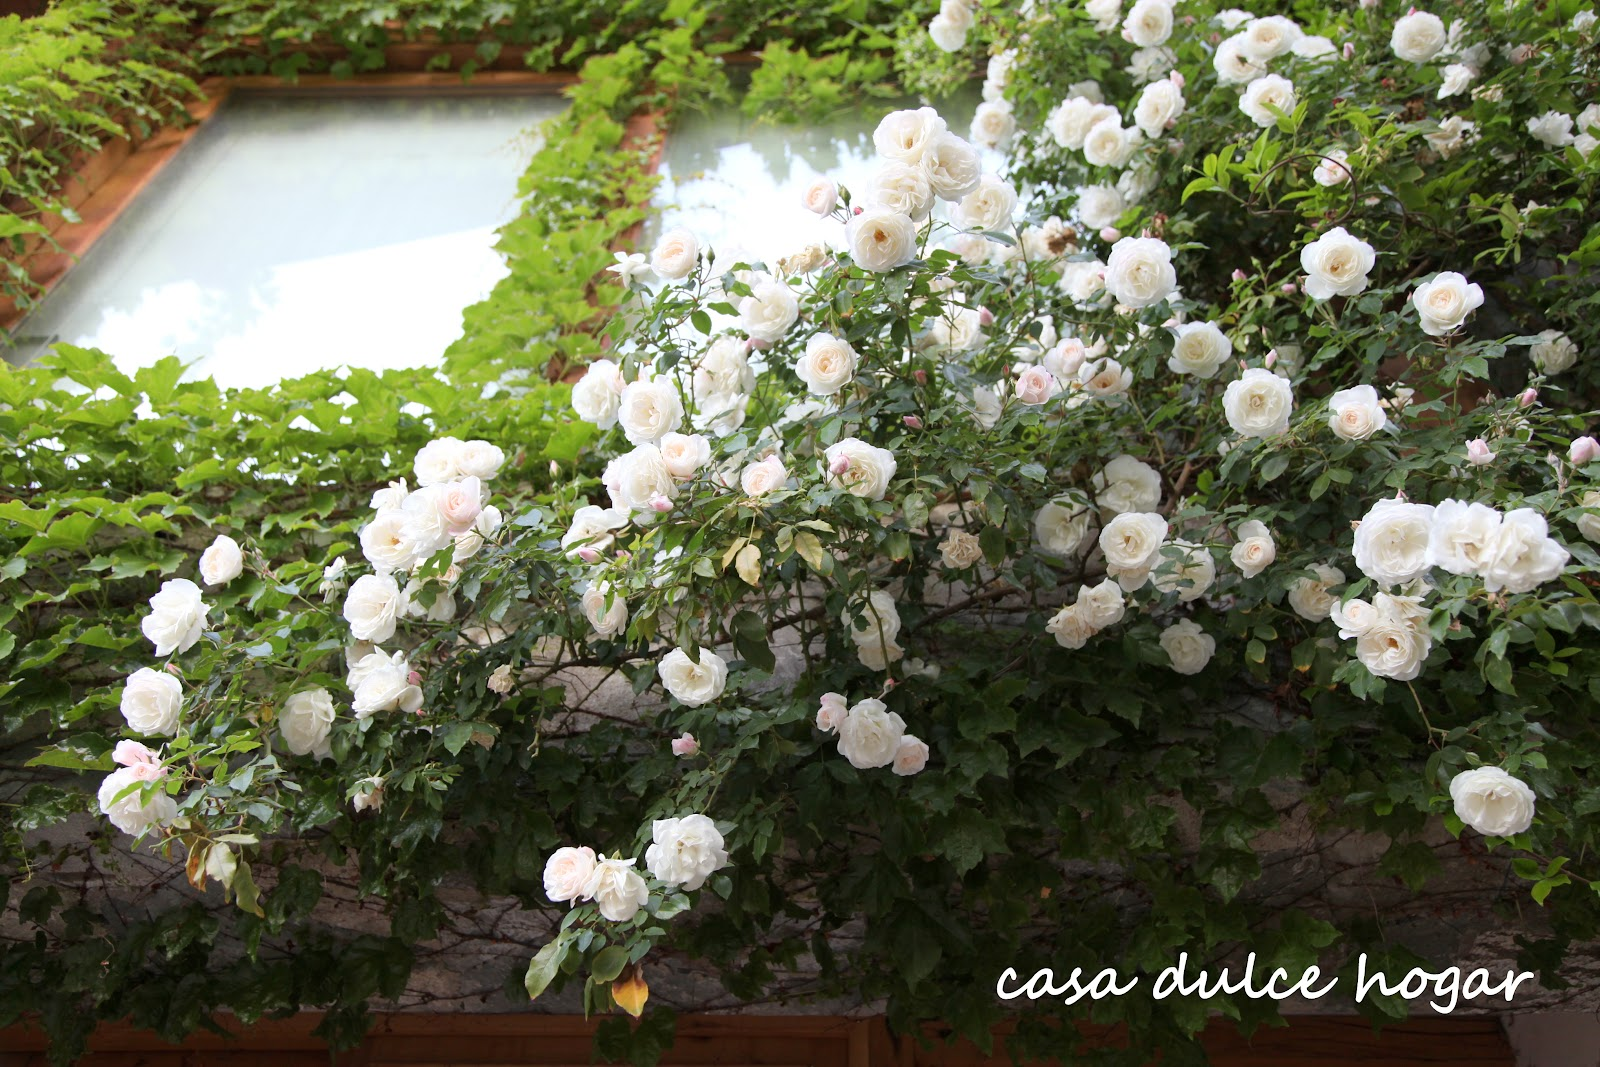 rosas blancas Descargar Fotos gratis Freepik